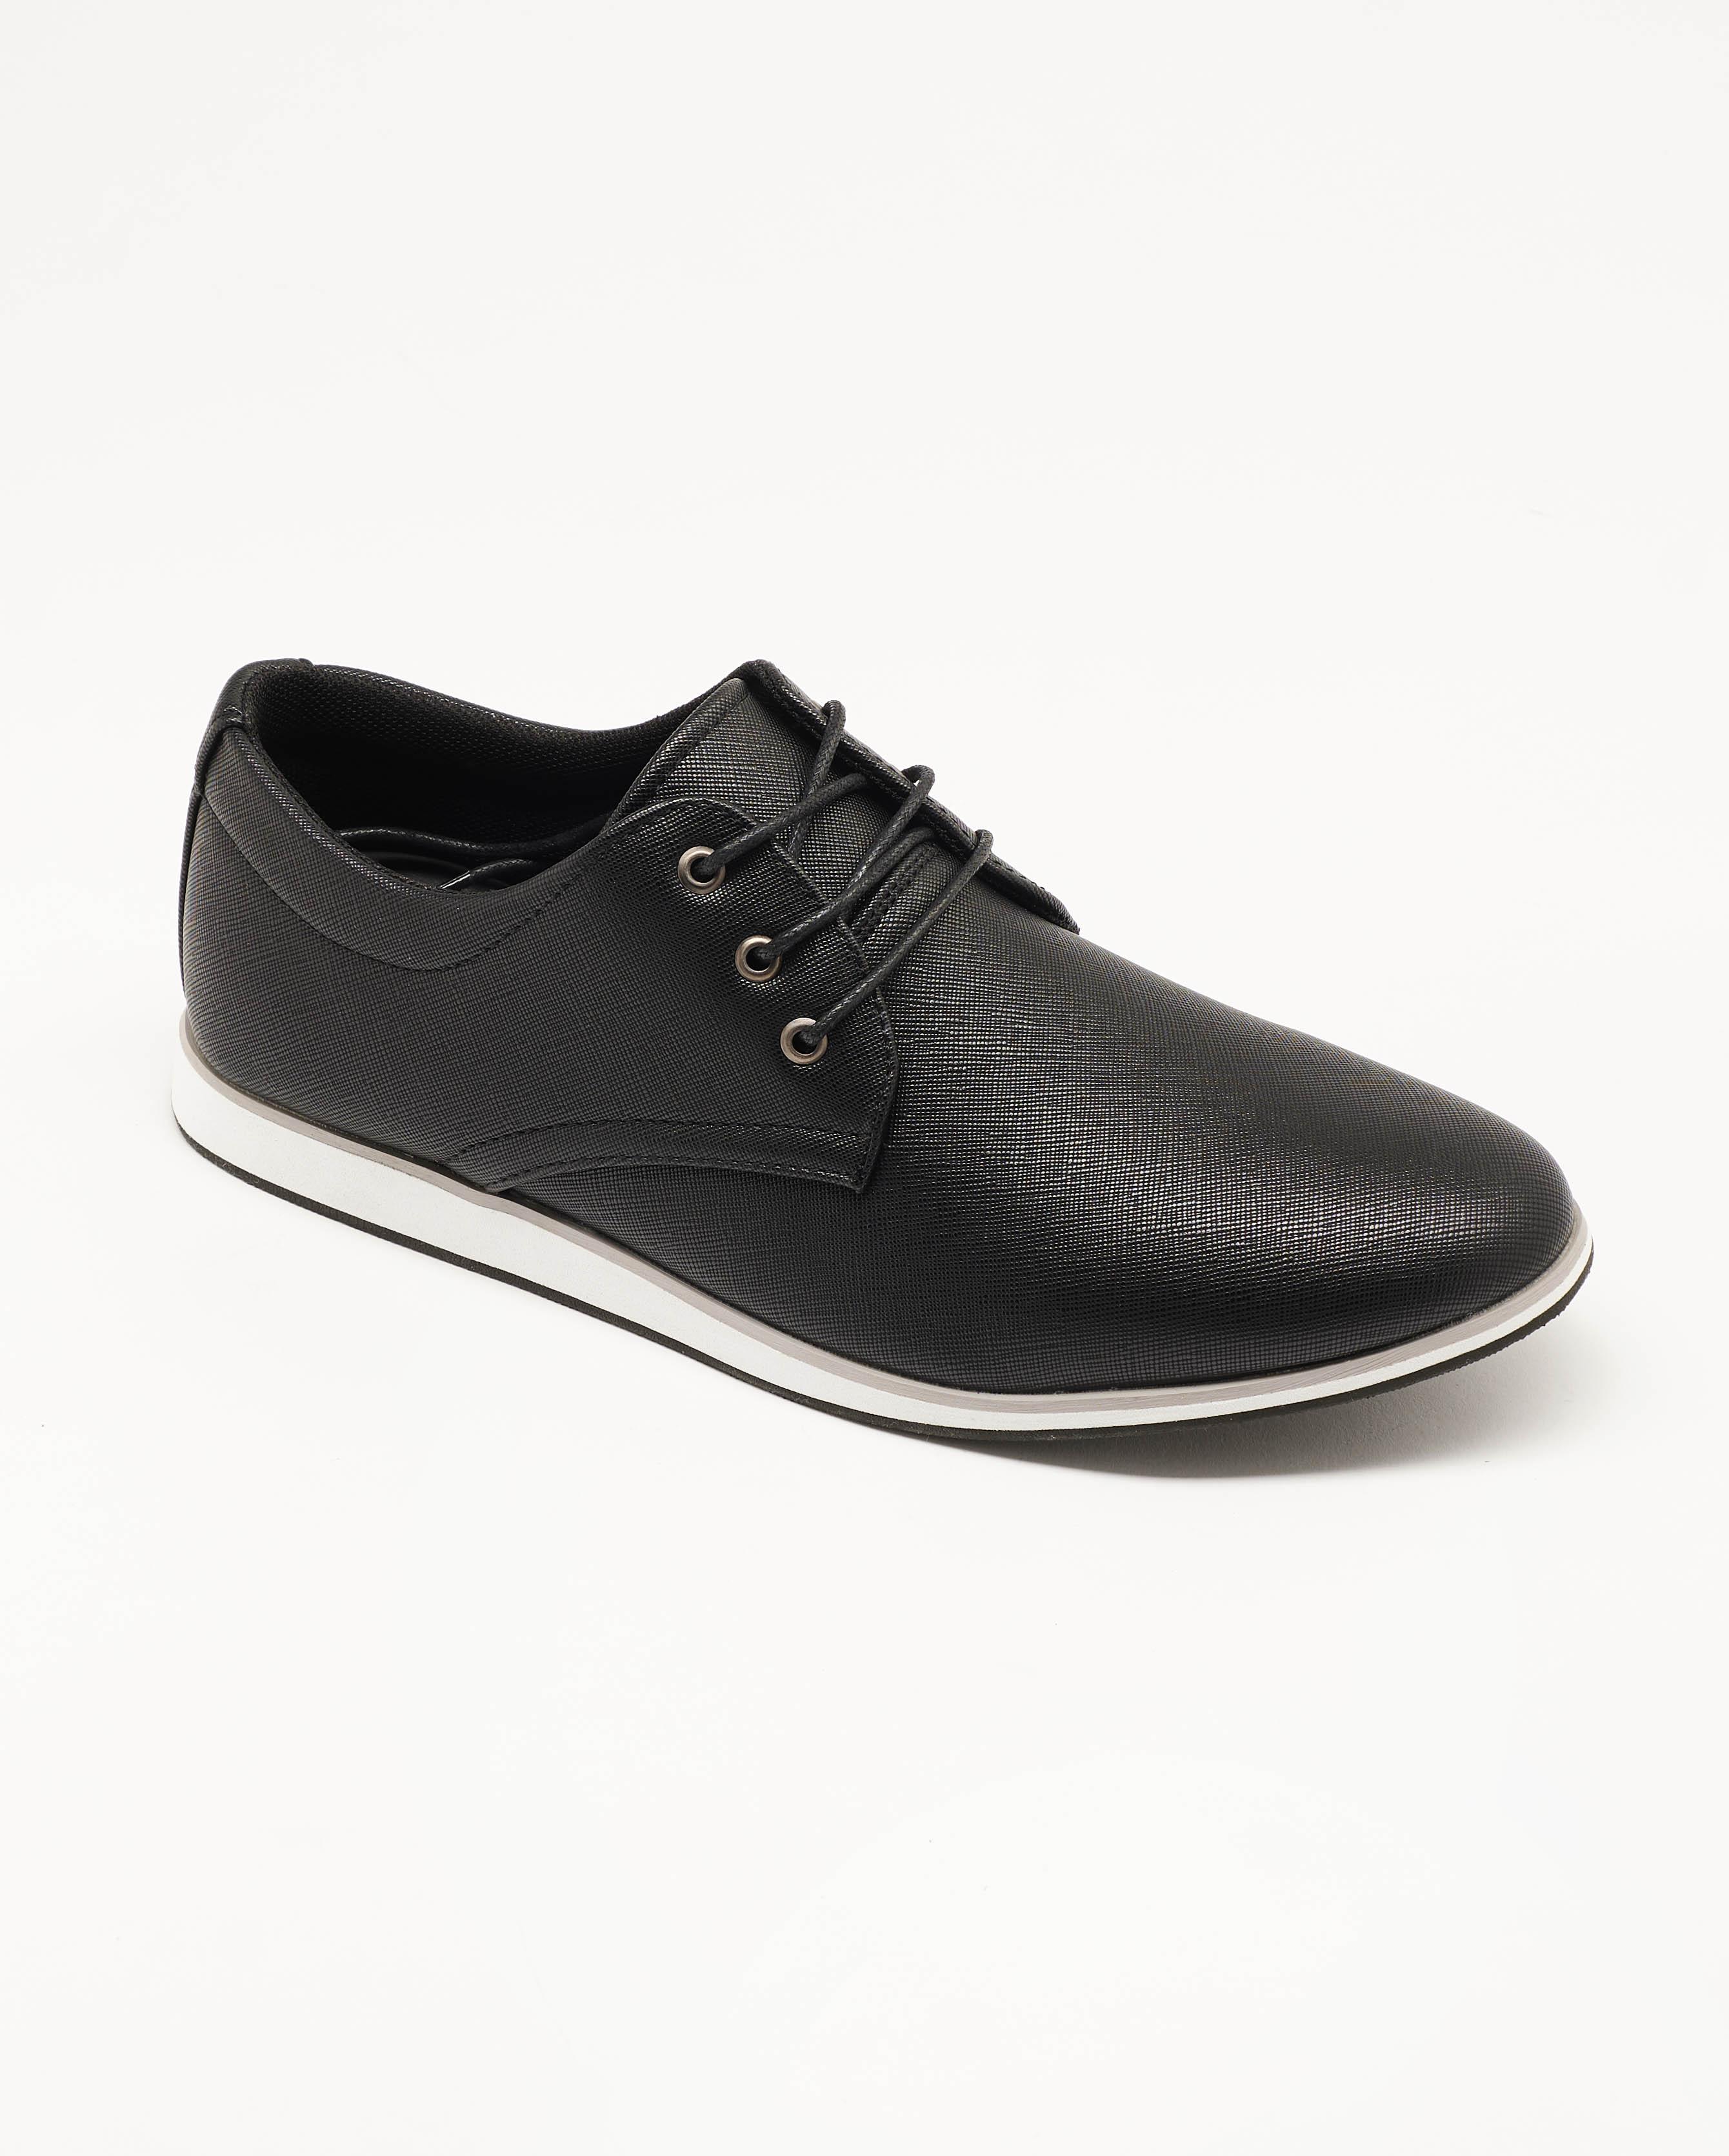 Chaussures De Ville Homme - Sneakers Noir Jina - U2111-07